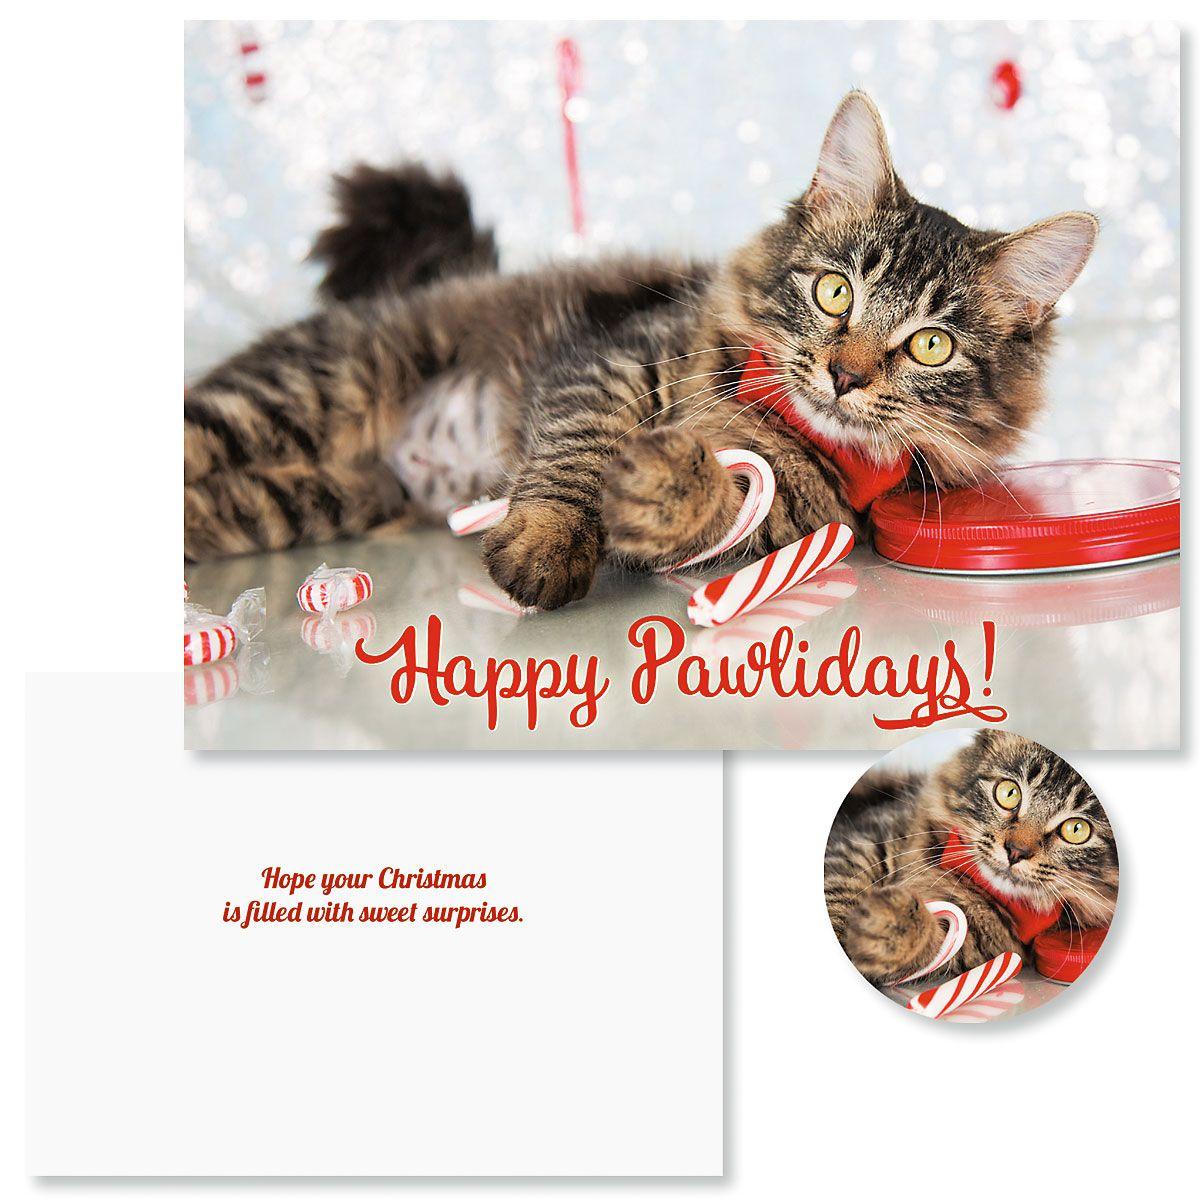 Happy Pawlidays Christmas Cards